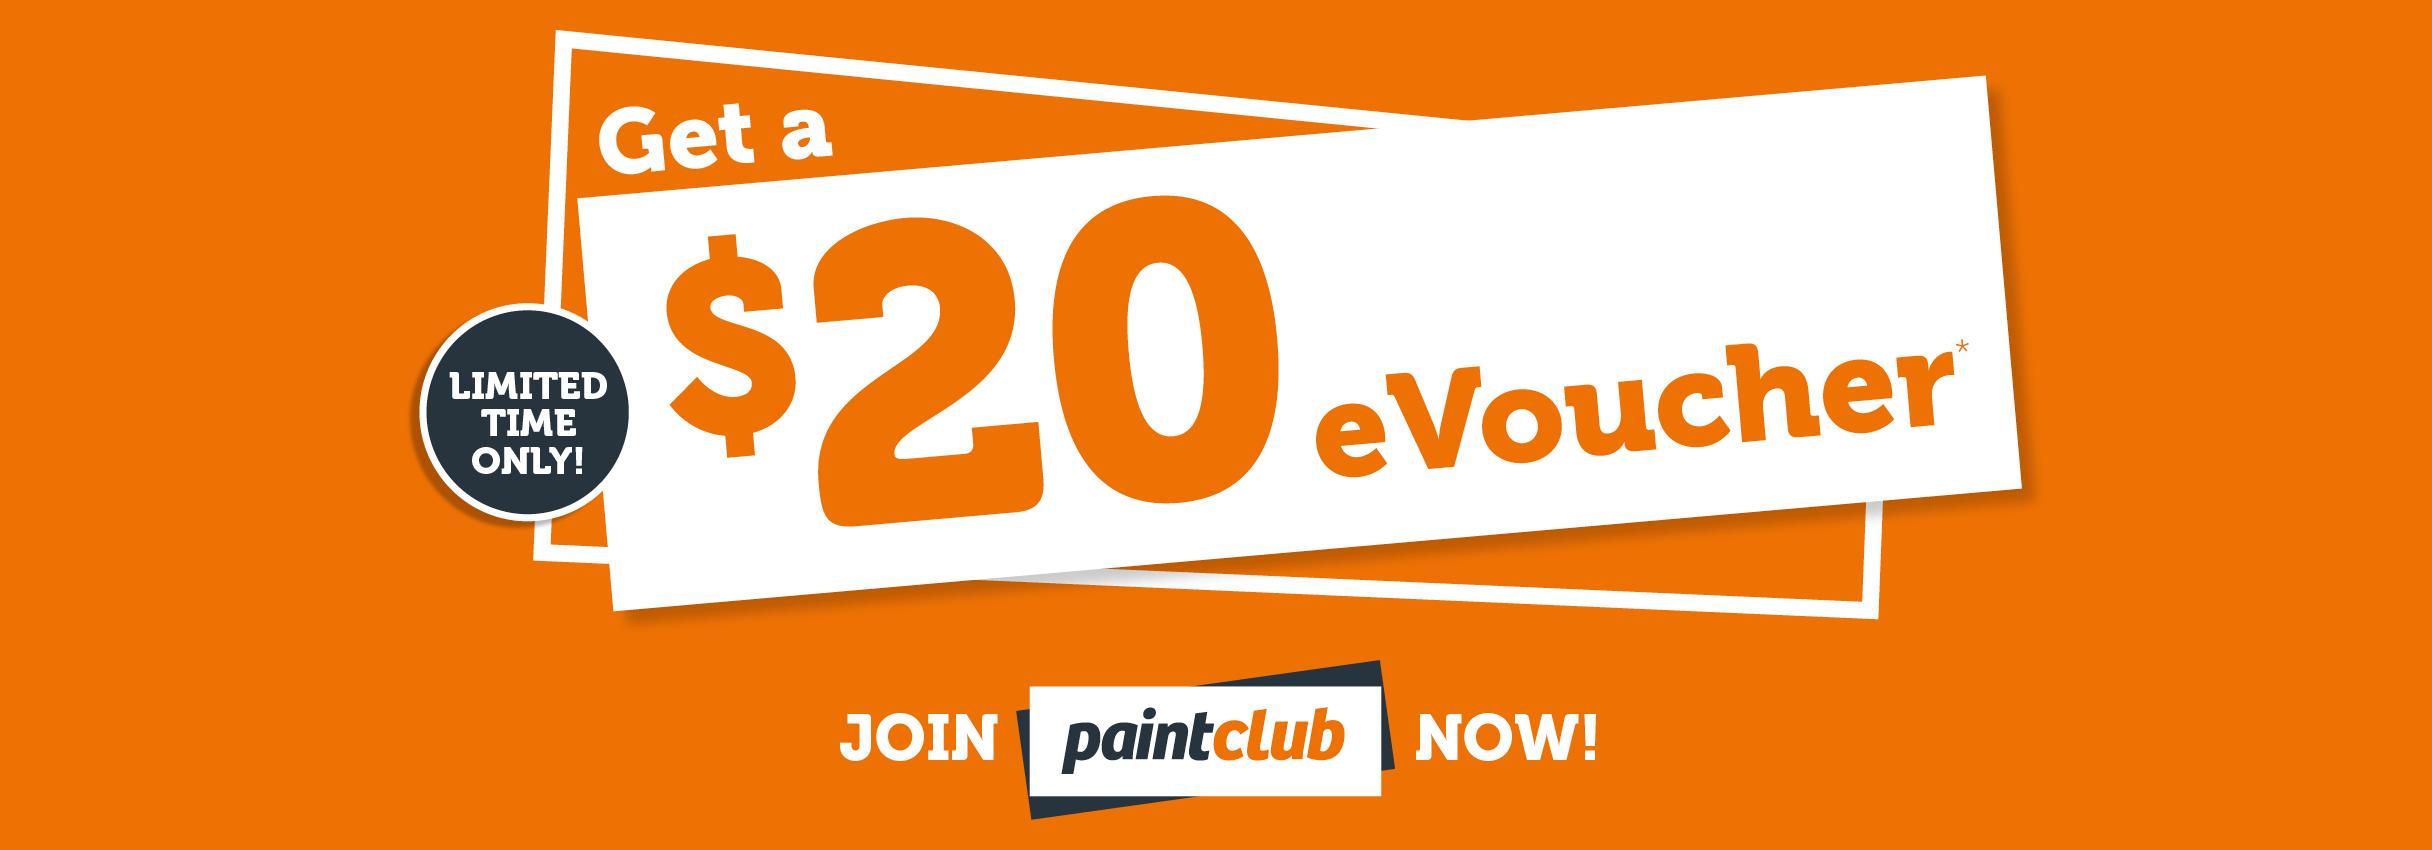 Get a $20 eVoucher - Join Paint Club Now!